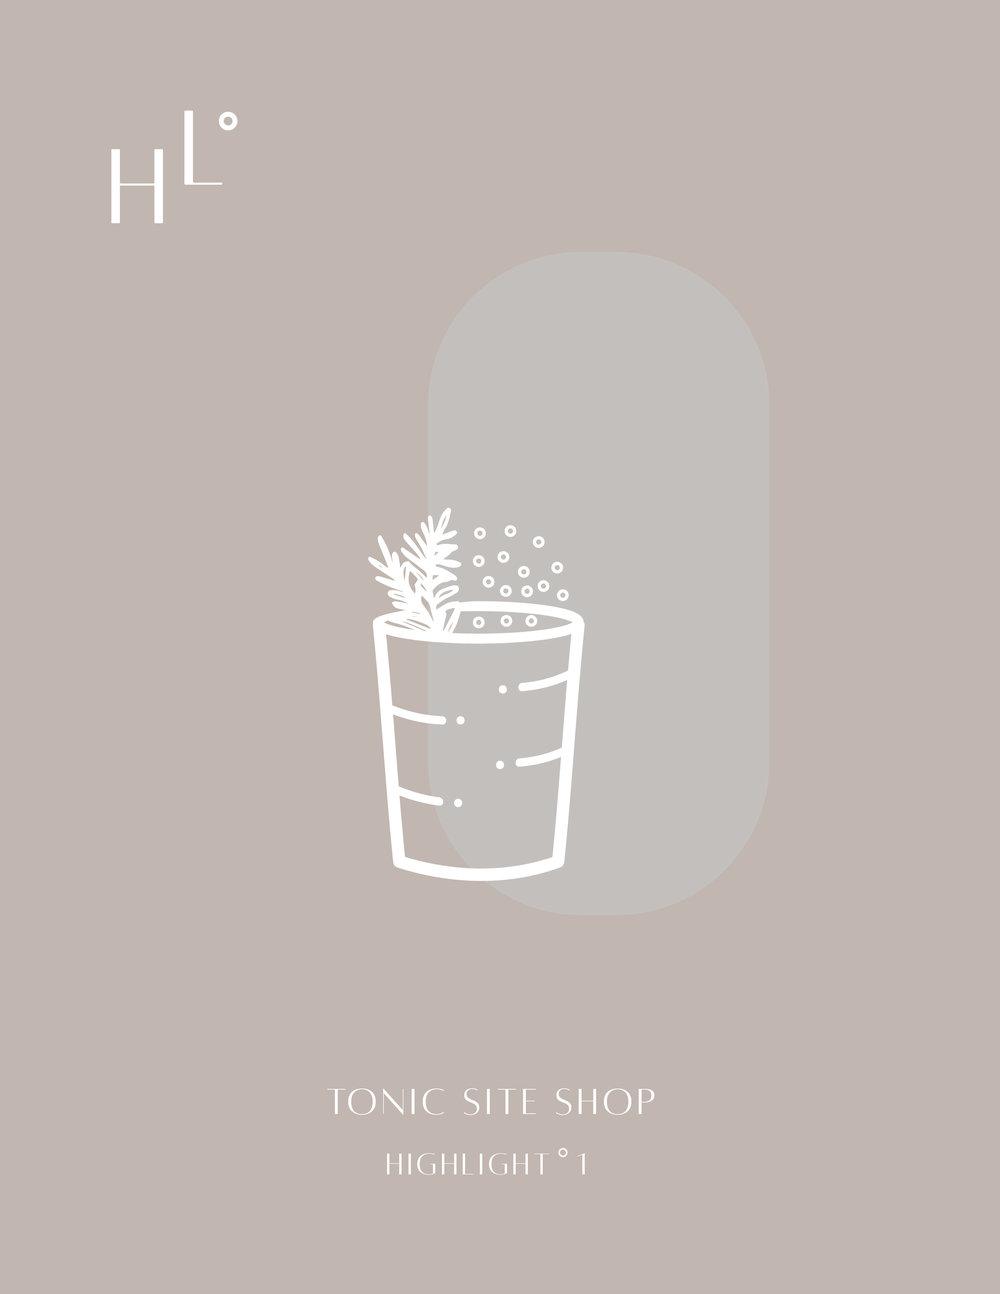 Wendling_Boyd_Highlight_Tonic_Site_Shop_Blog_Post.jpg